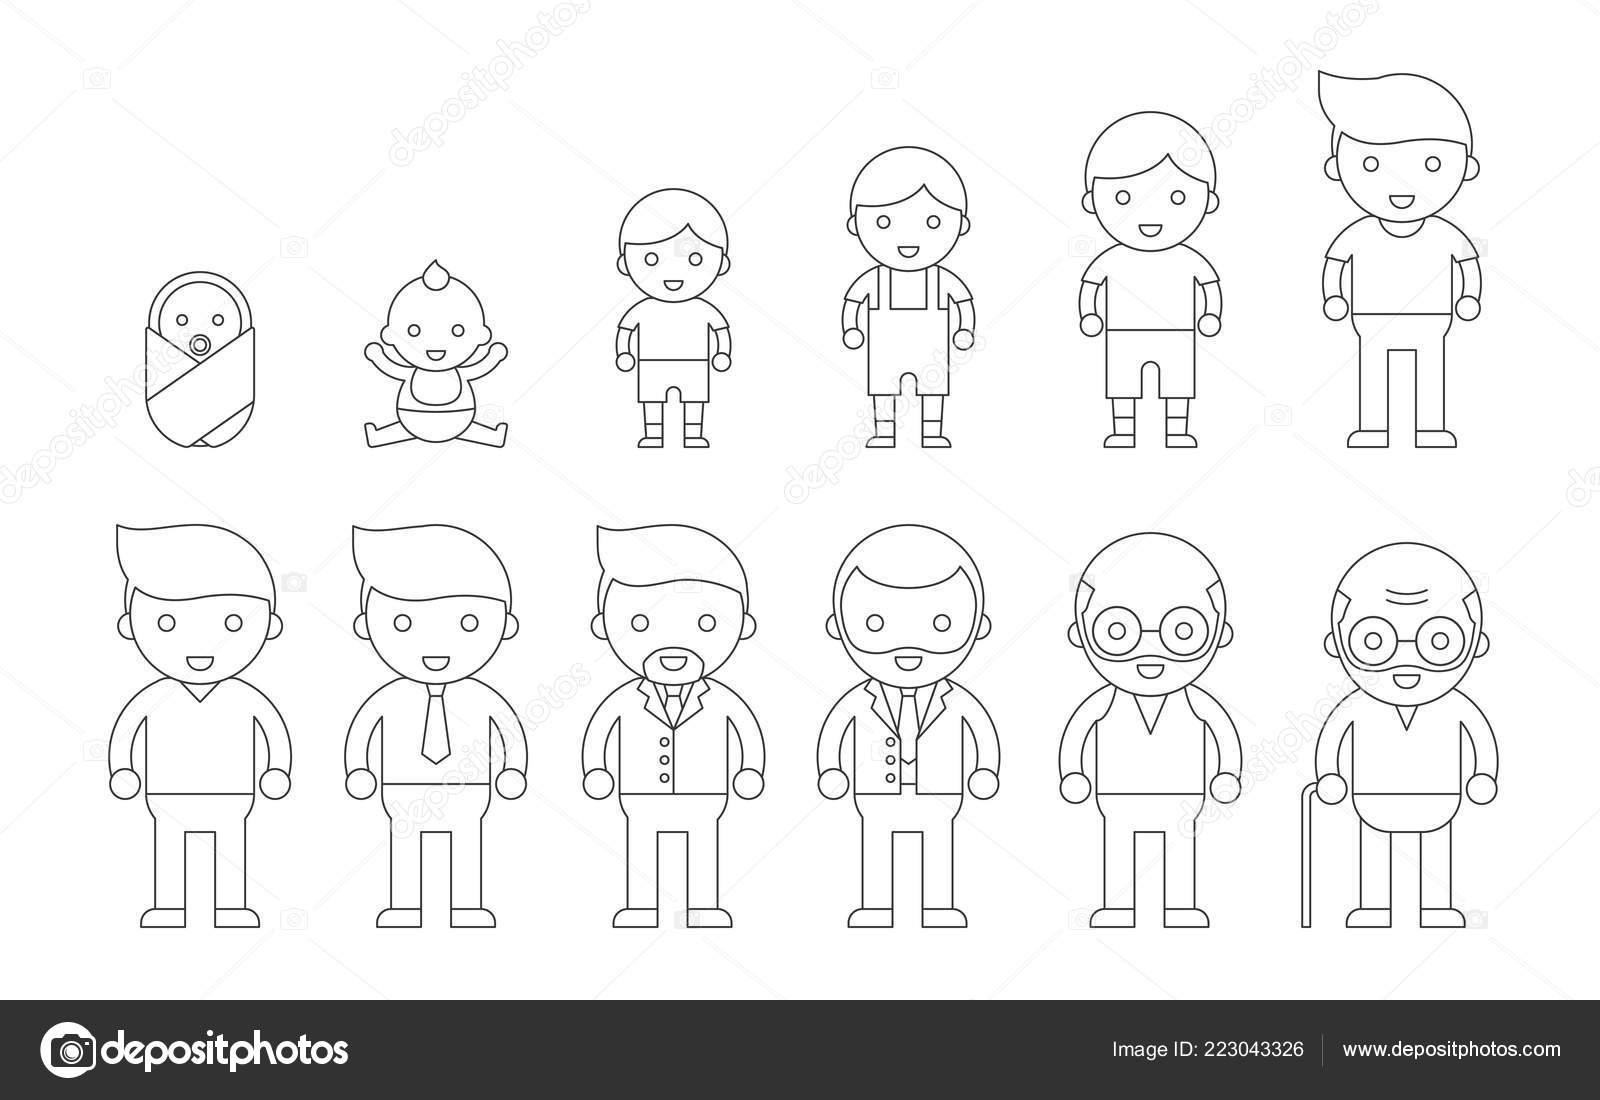 Human Life Cycle Male Newborn Children Teenage Adult